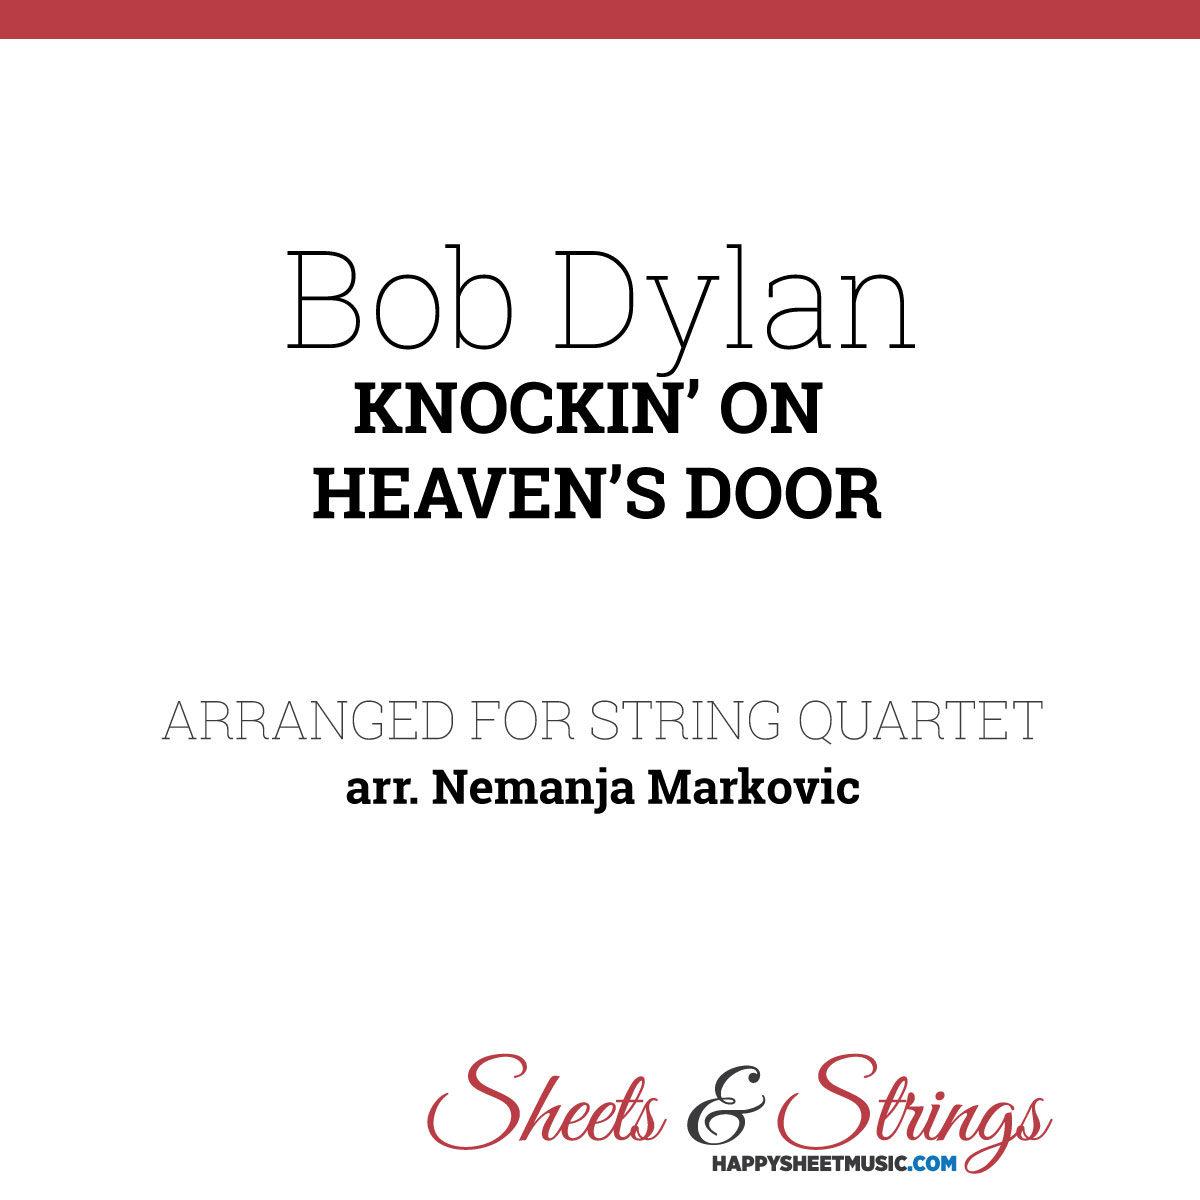 Bob Dylan - Knockin' On Heaven's Door - Sheet Music for String Quartet - Music Arrangement for String Quartet